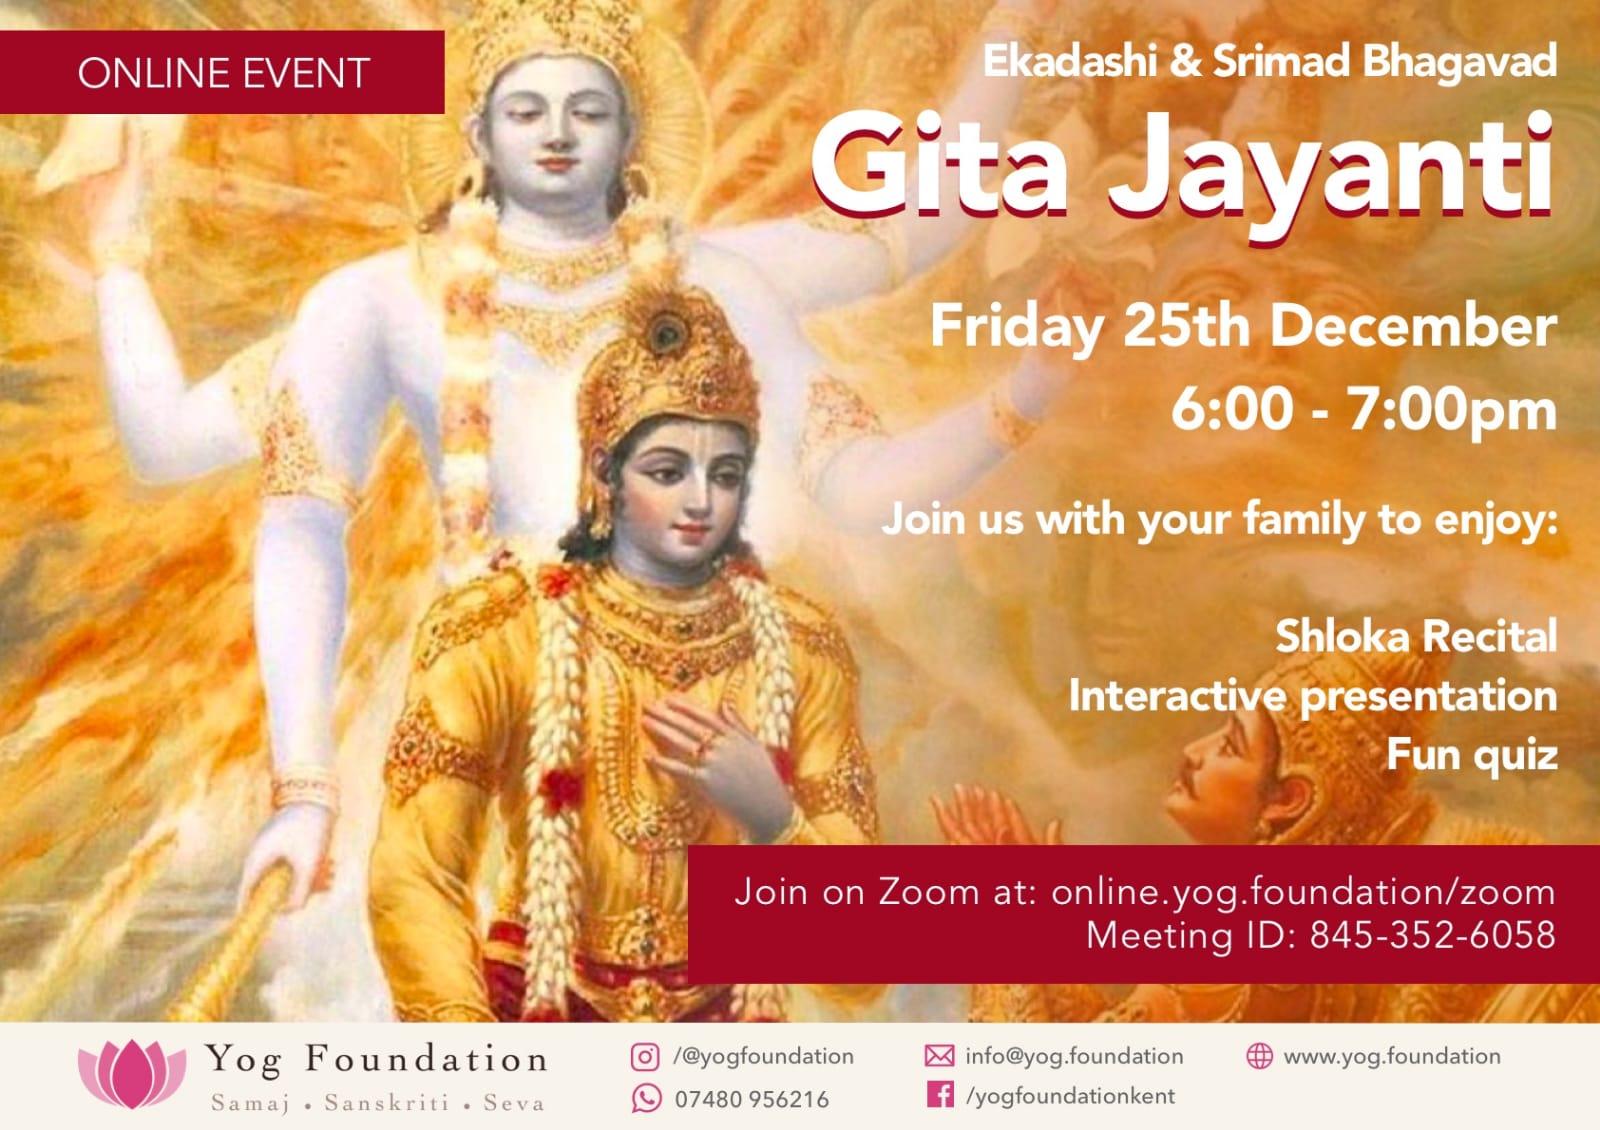 Bhagavad Gita Jayanti 2020